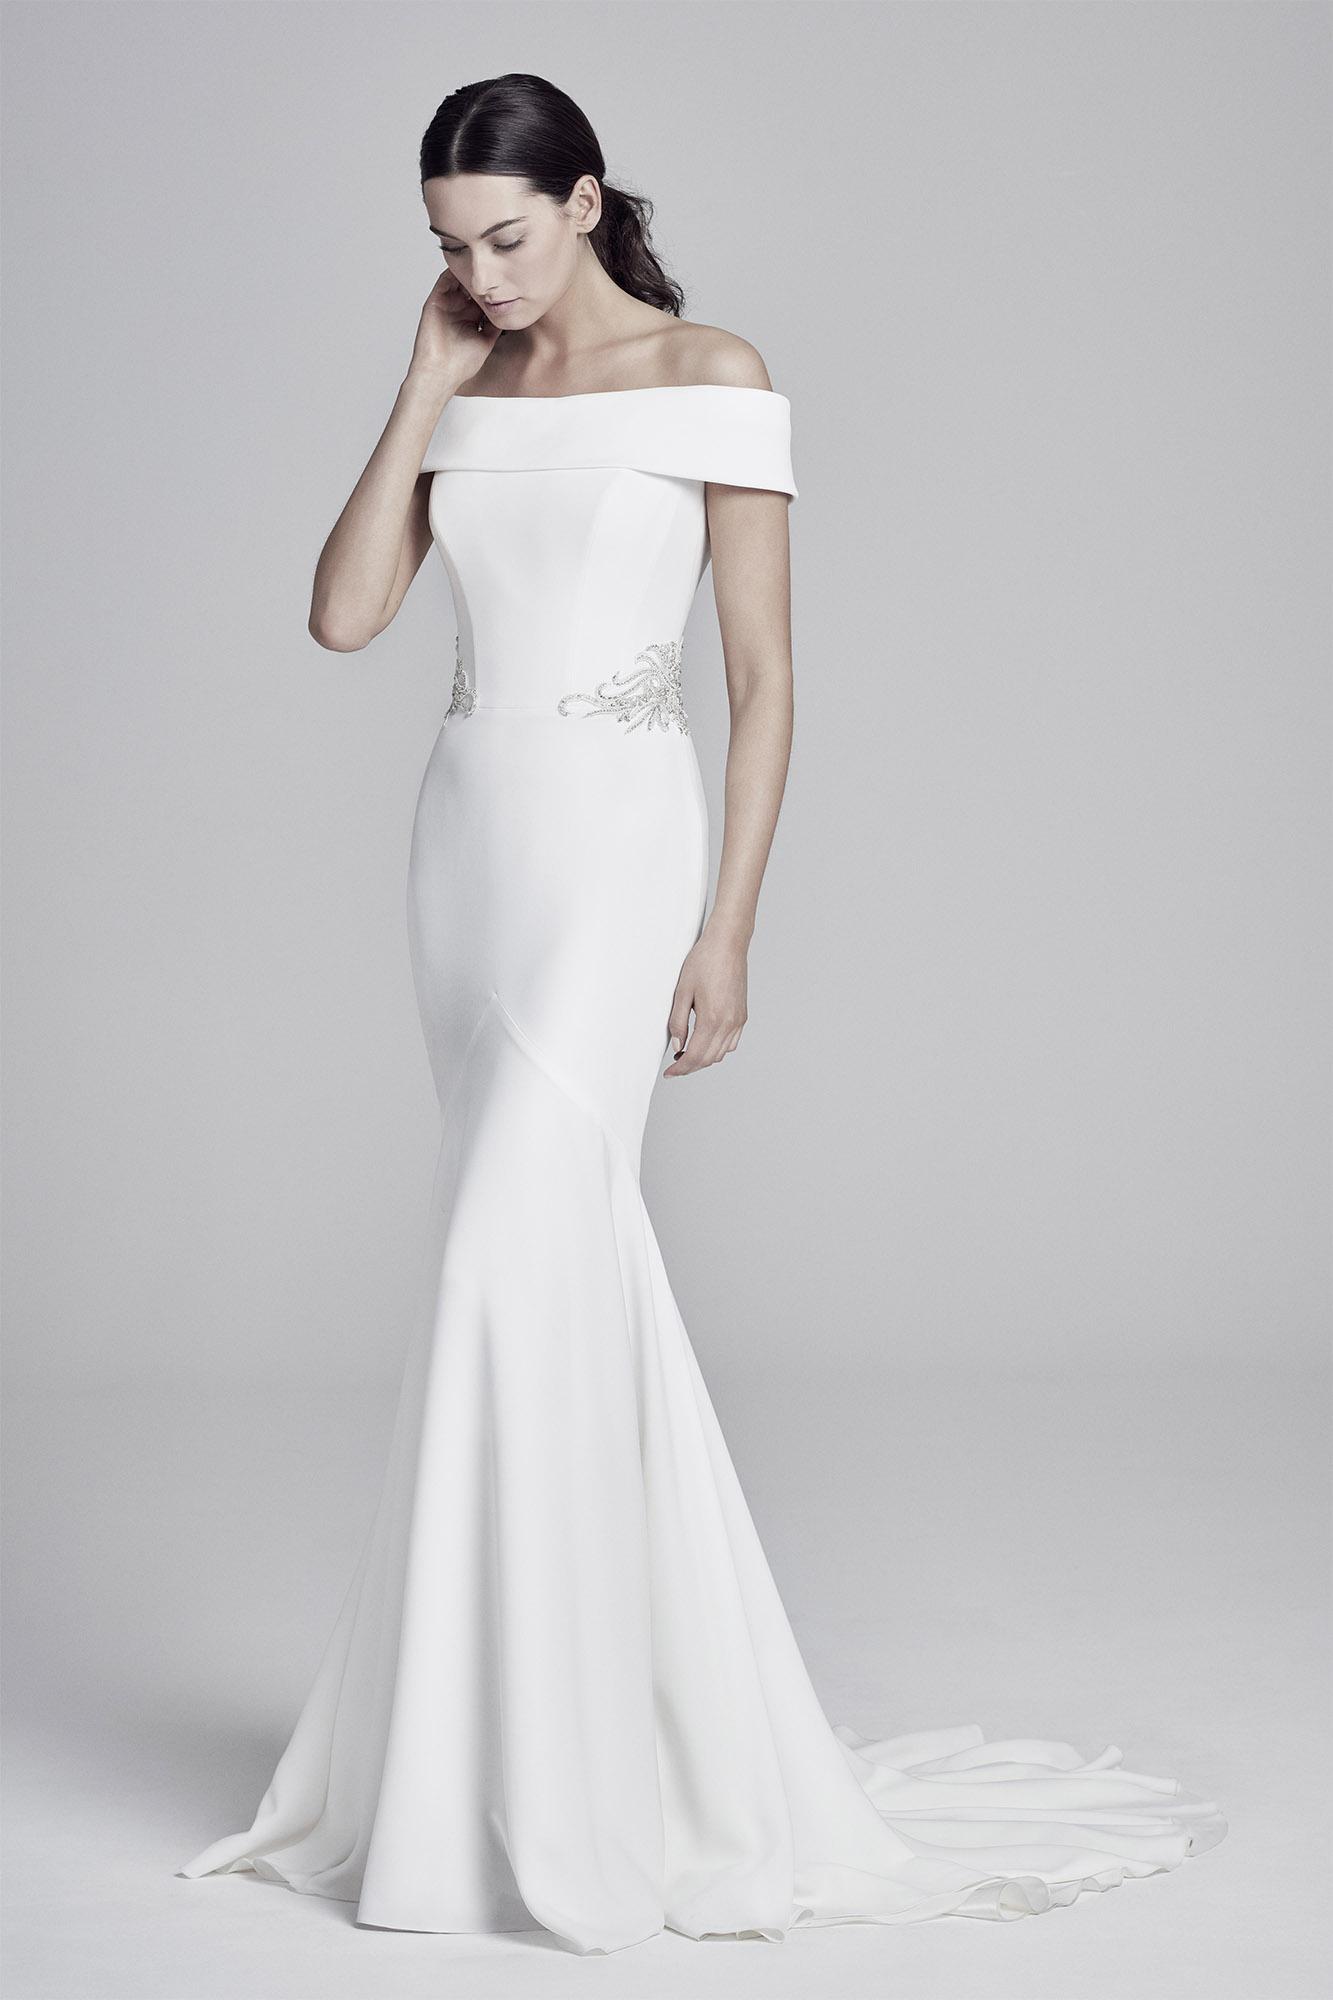 orianna collections 2019 lookbook uk designer wedding